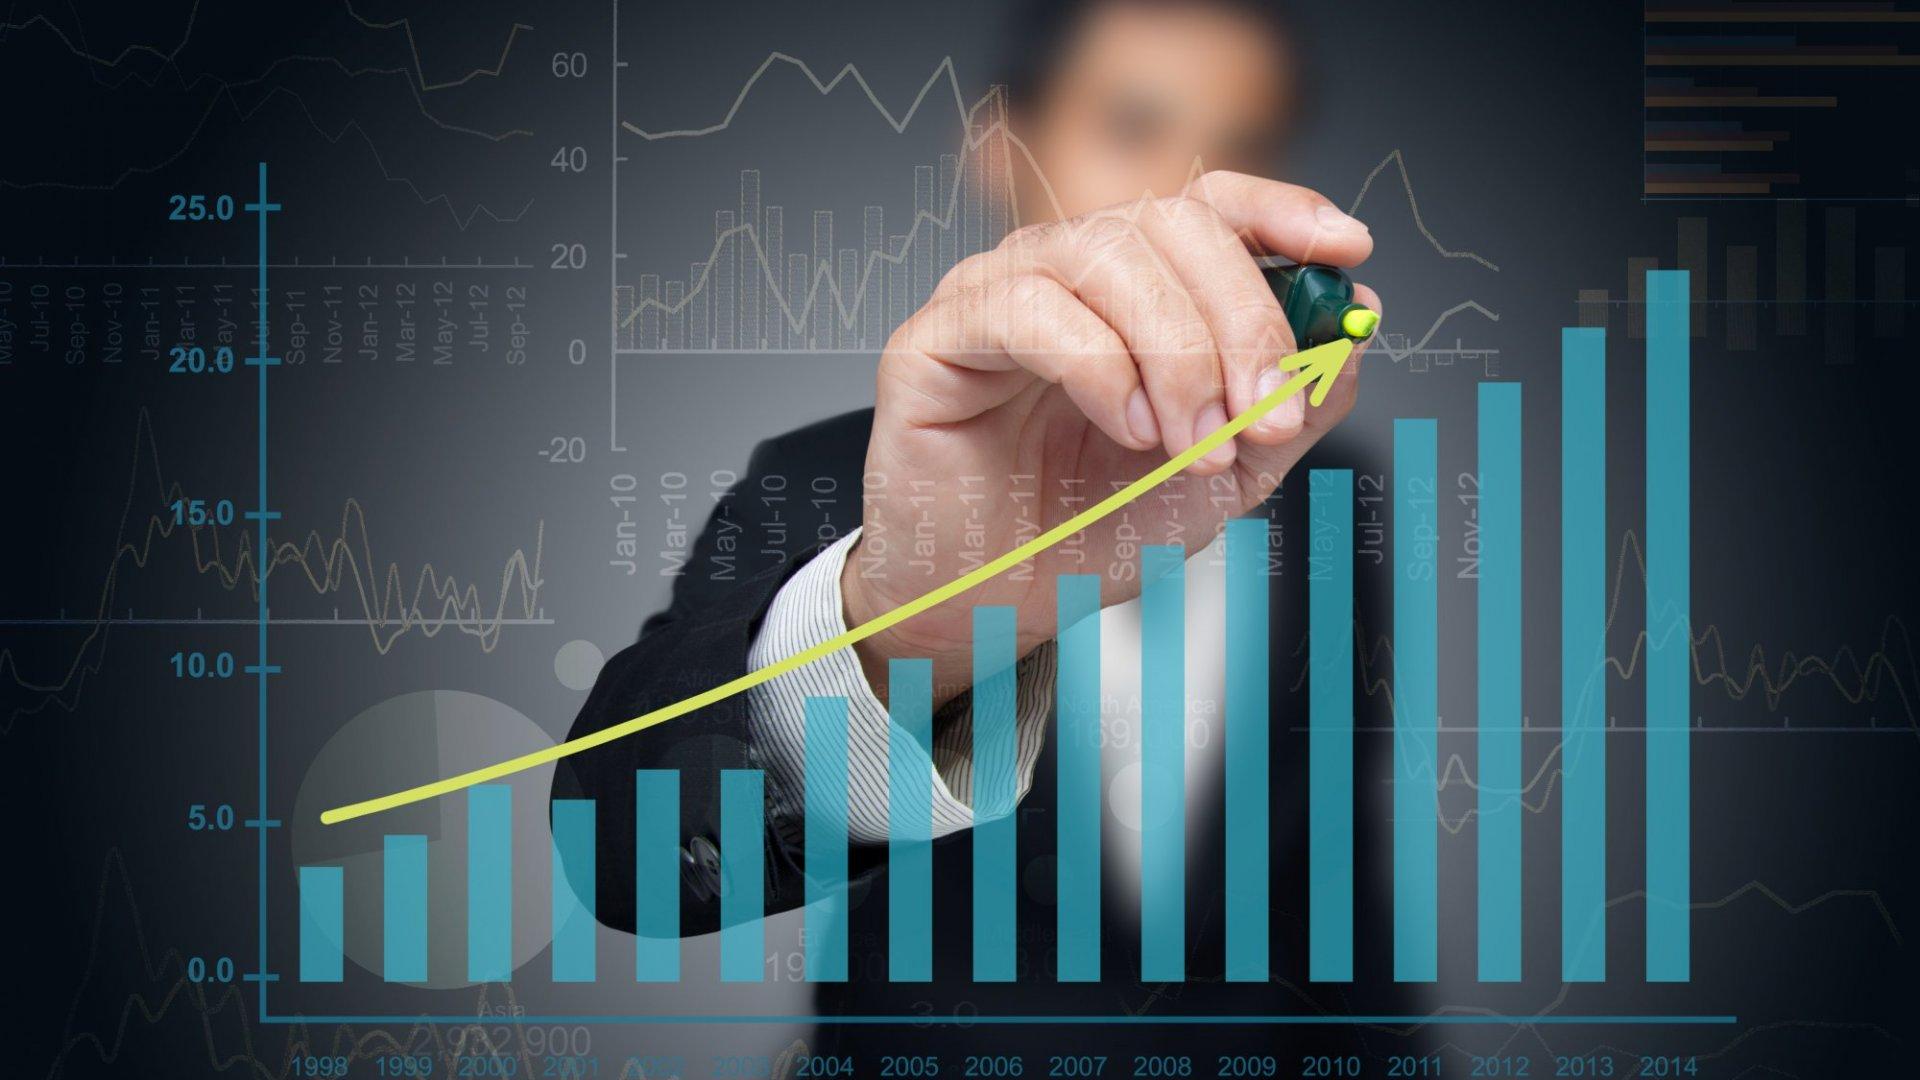 Townsquare Media Meets Third Quarter Profit Forecasts